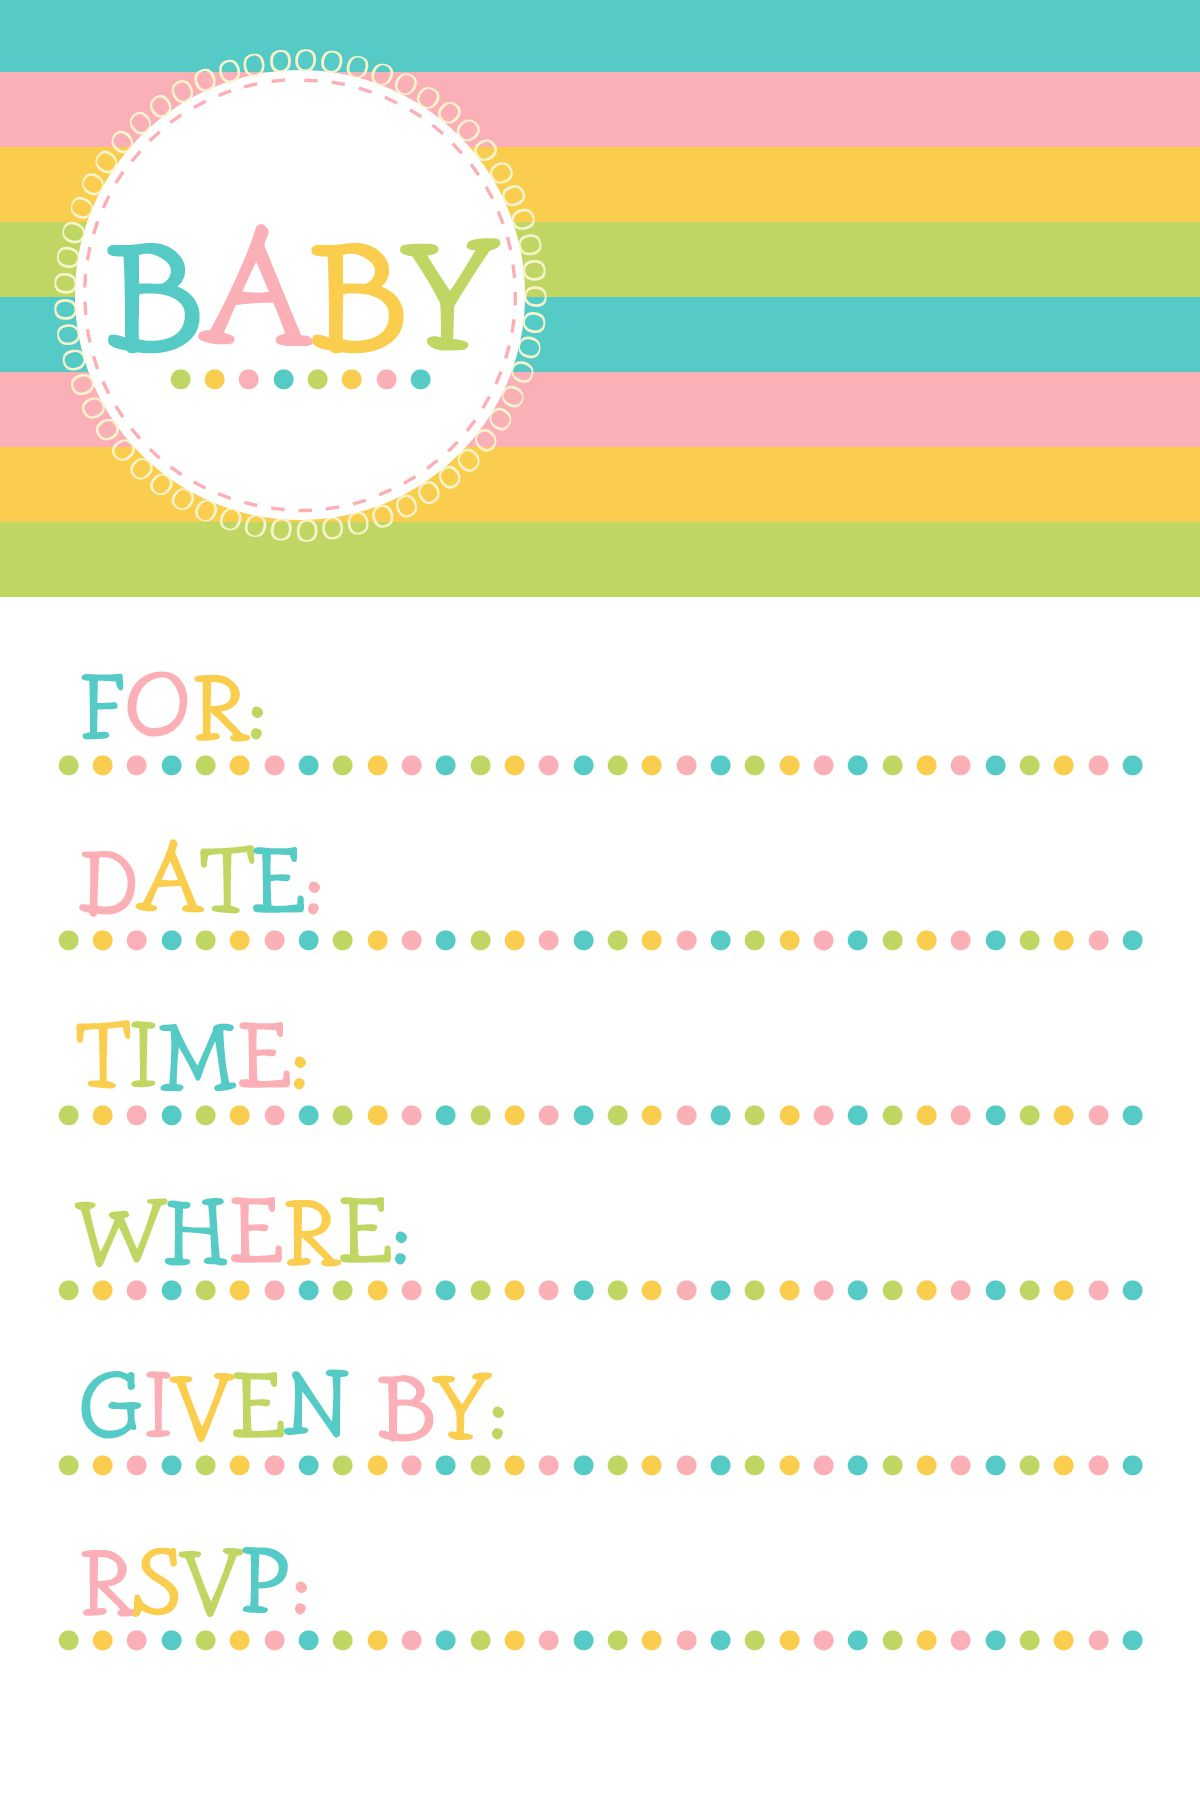 Doc Descargar Invitation Baby Shower Template